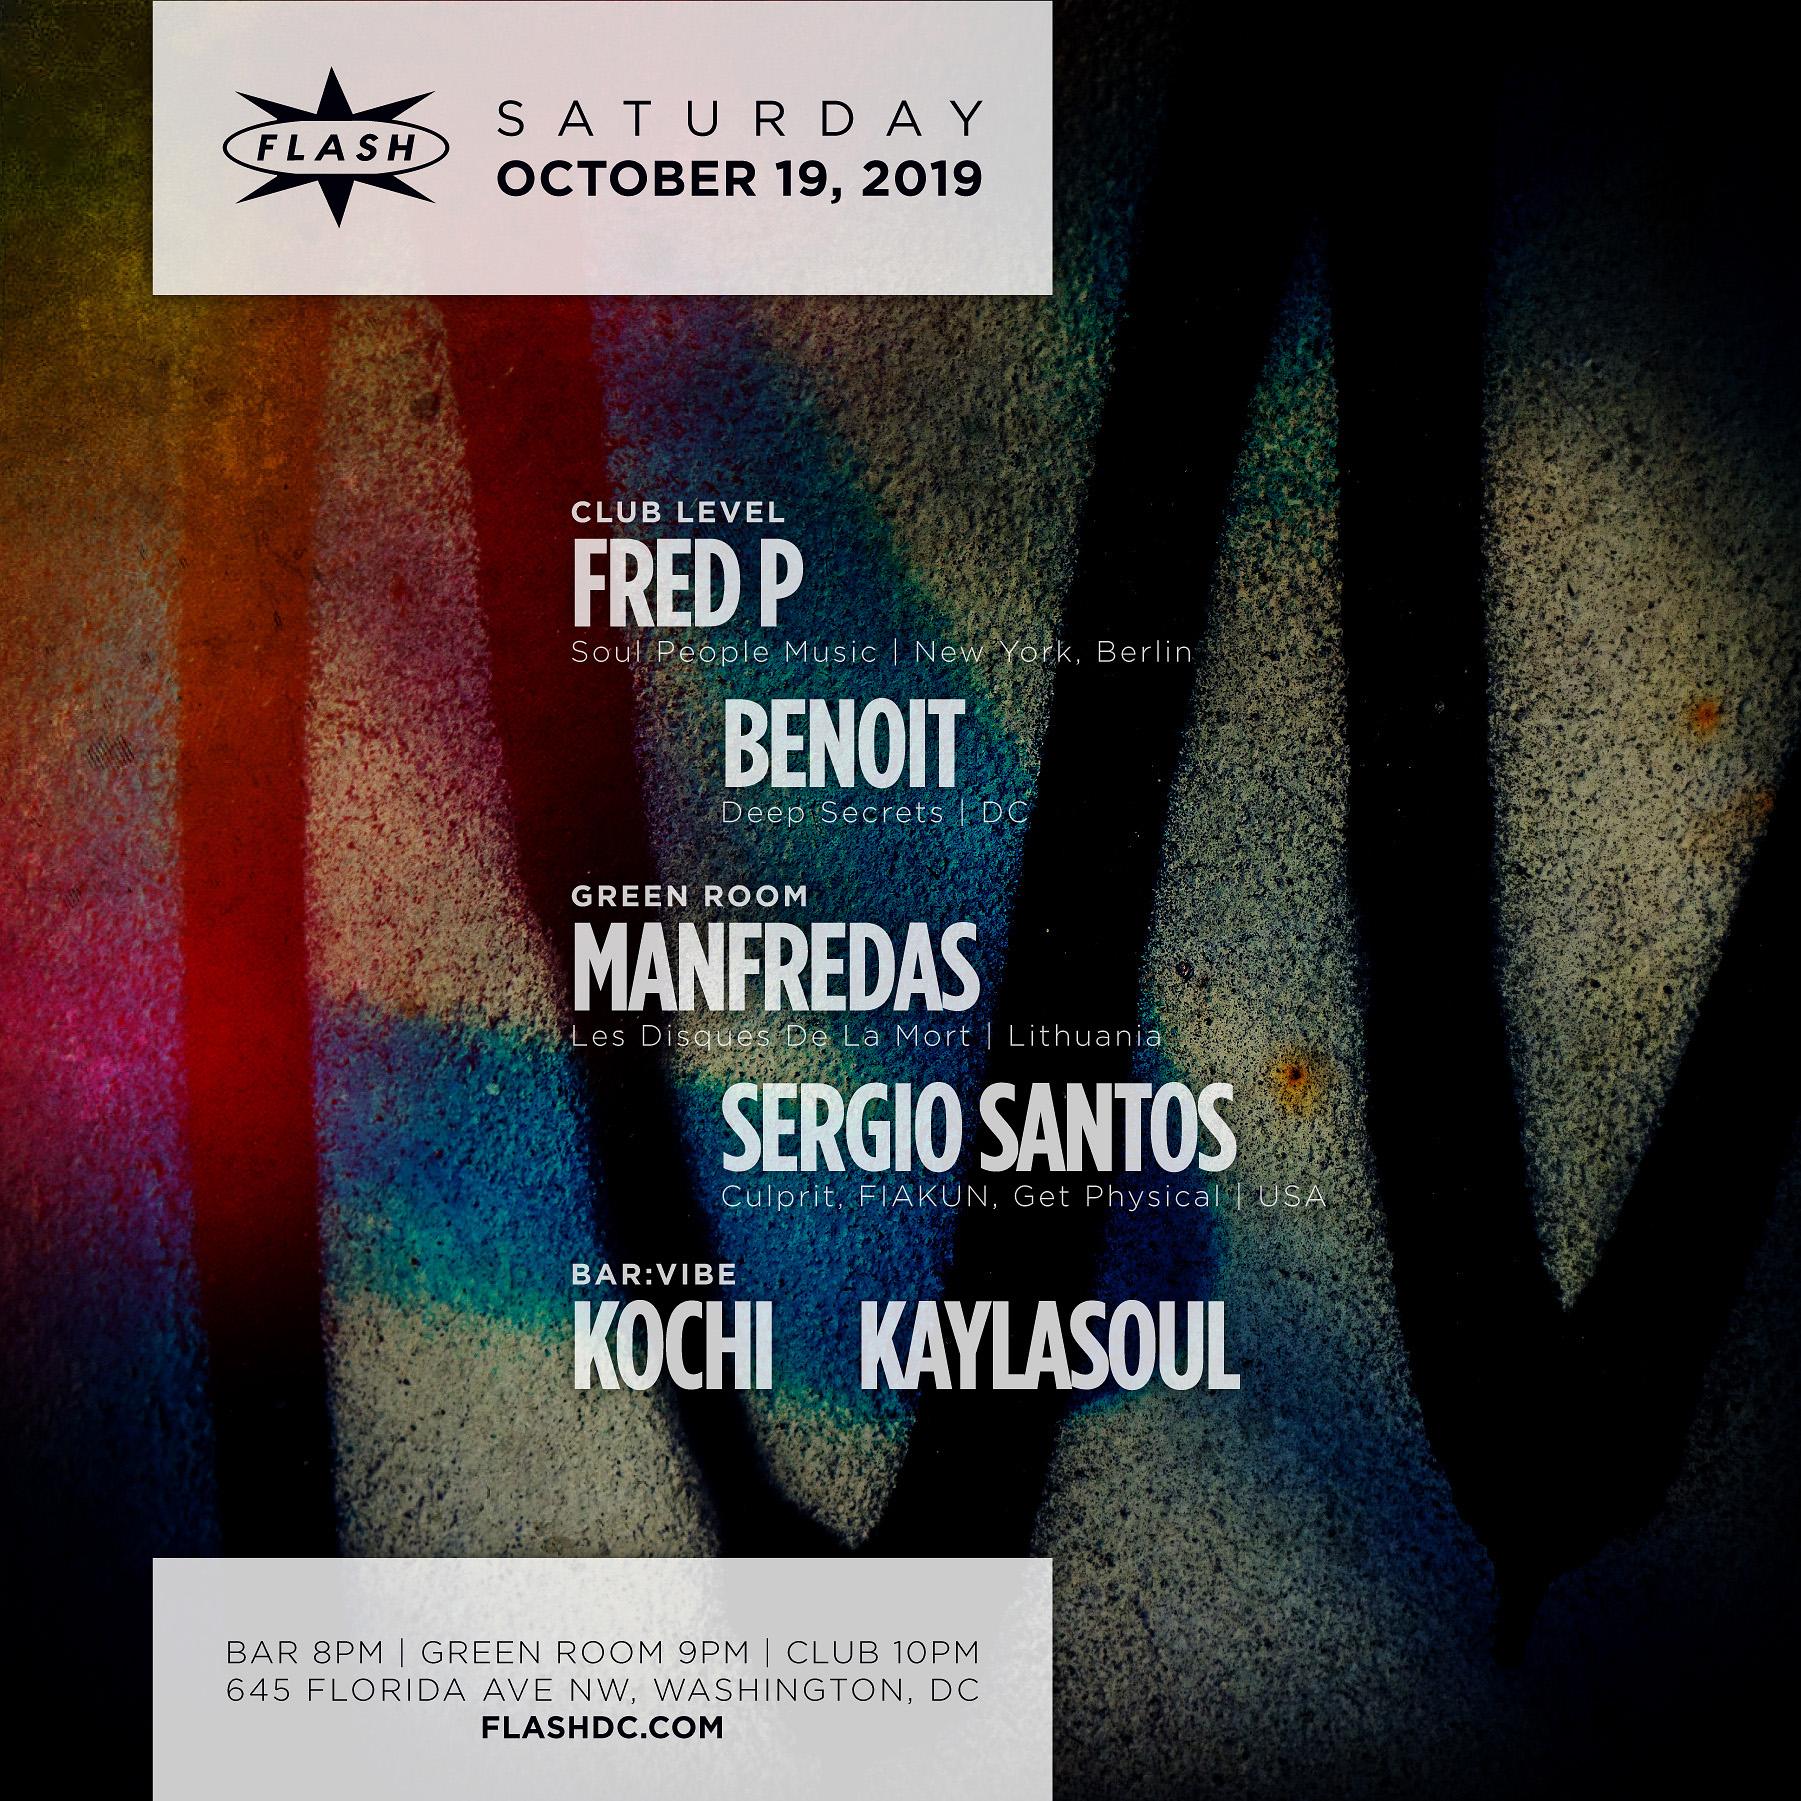 Fred P - Manfredas - Sergio Santos - Kochi - KaylaSoul event thumbnail